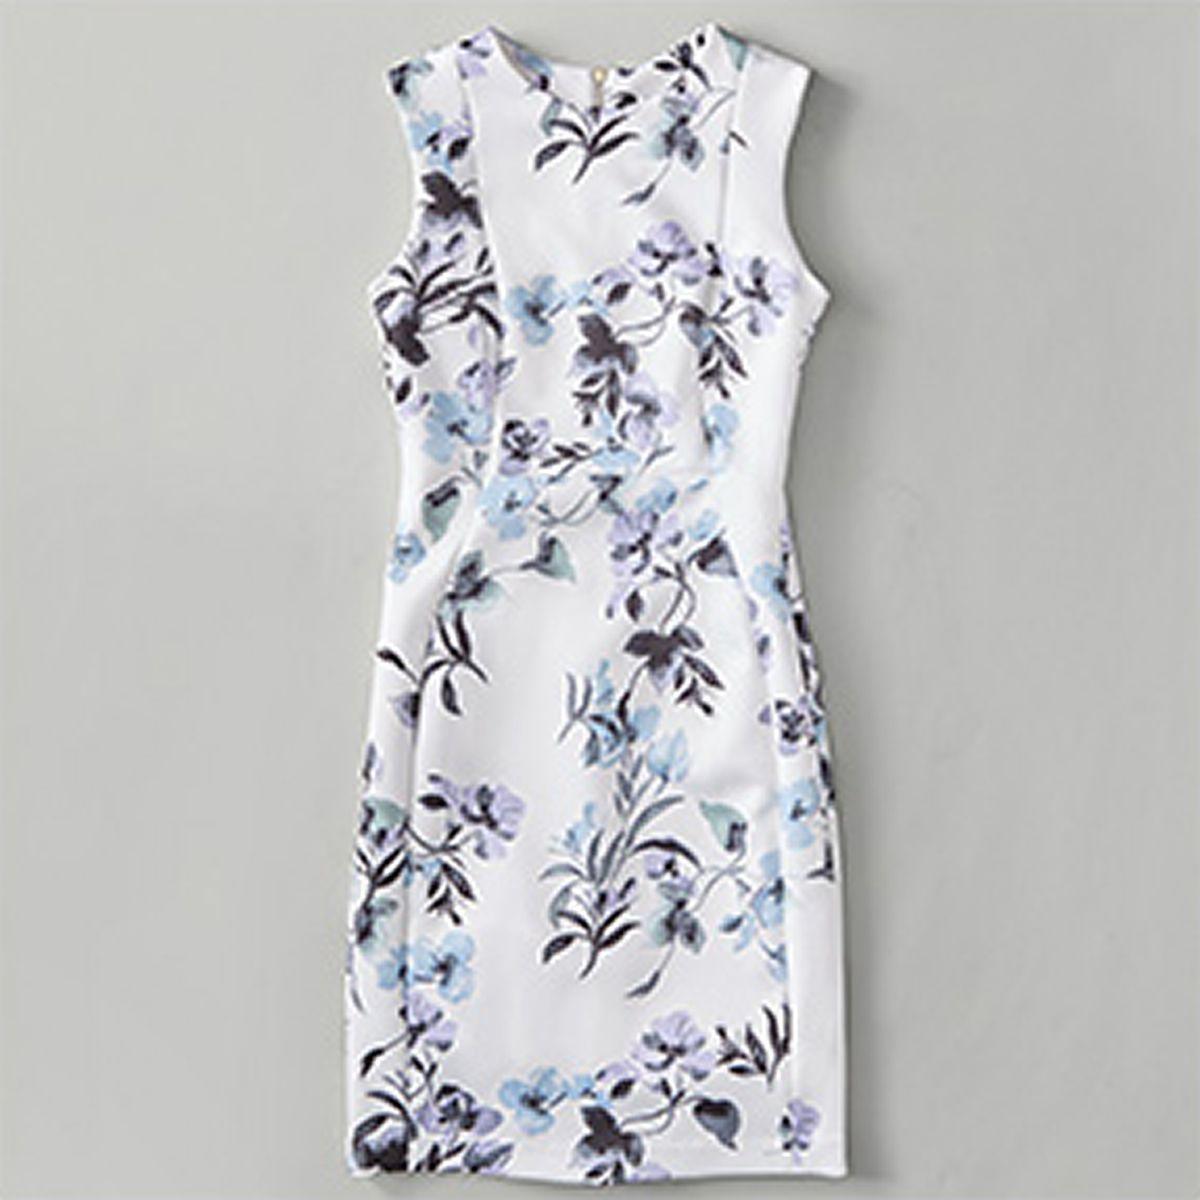 eb5caa4bab1ae Women s Clothing and Fashion - Macy s